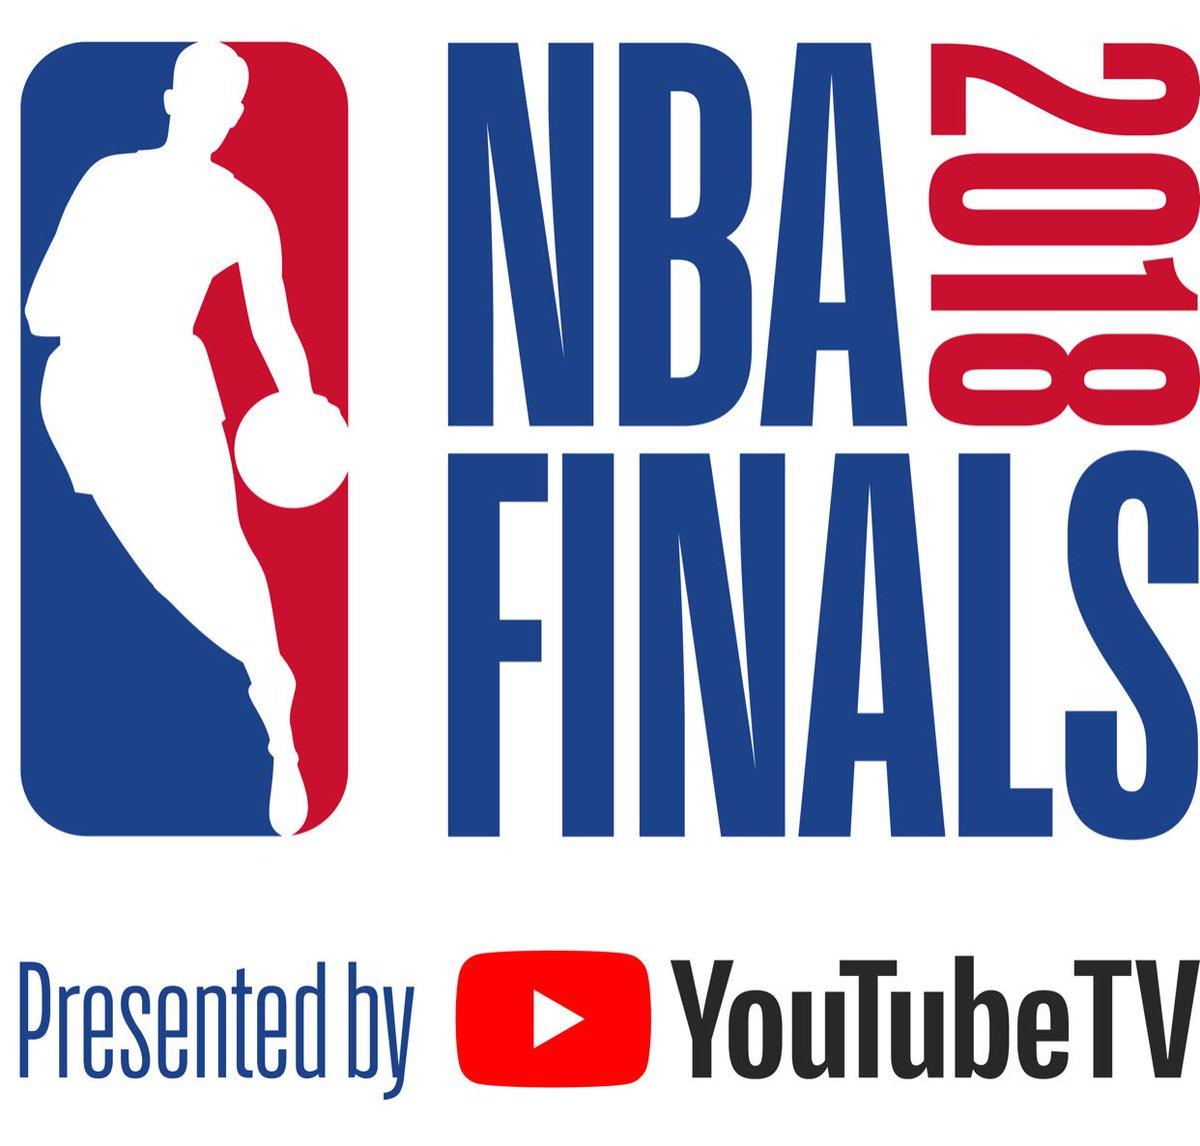 The Nba Finals Logo Reimagined Scottsmoker